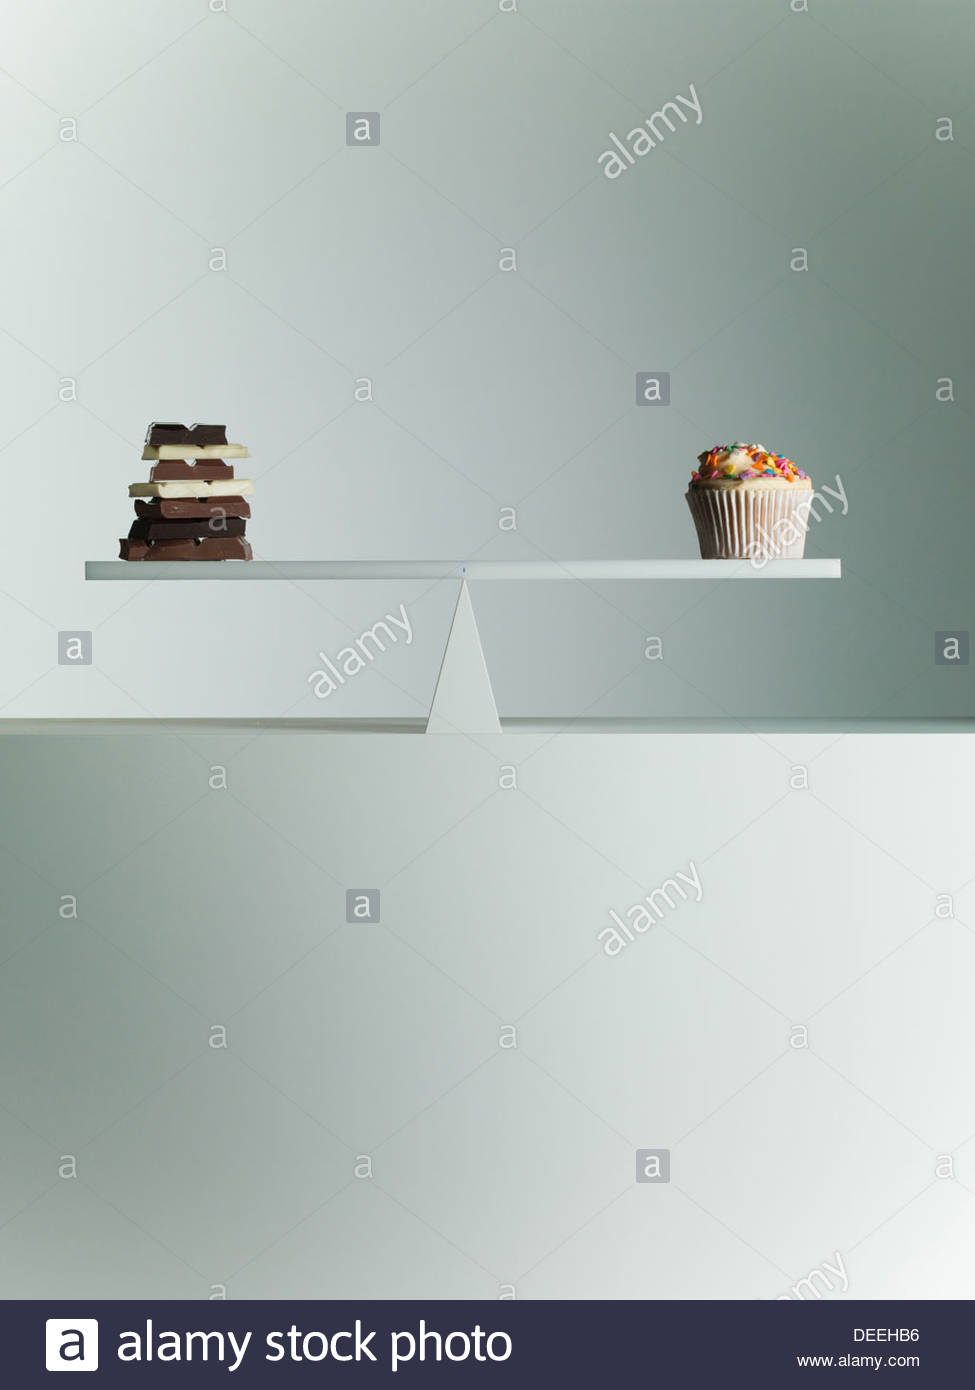 Barras de chocolate y Cupcake equilibrado a balancín Imagen De Stock